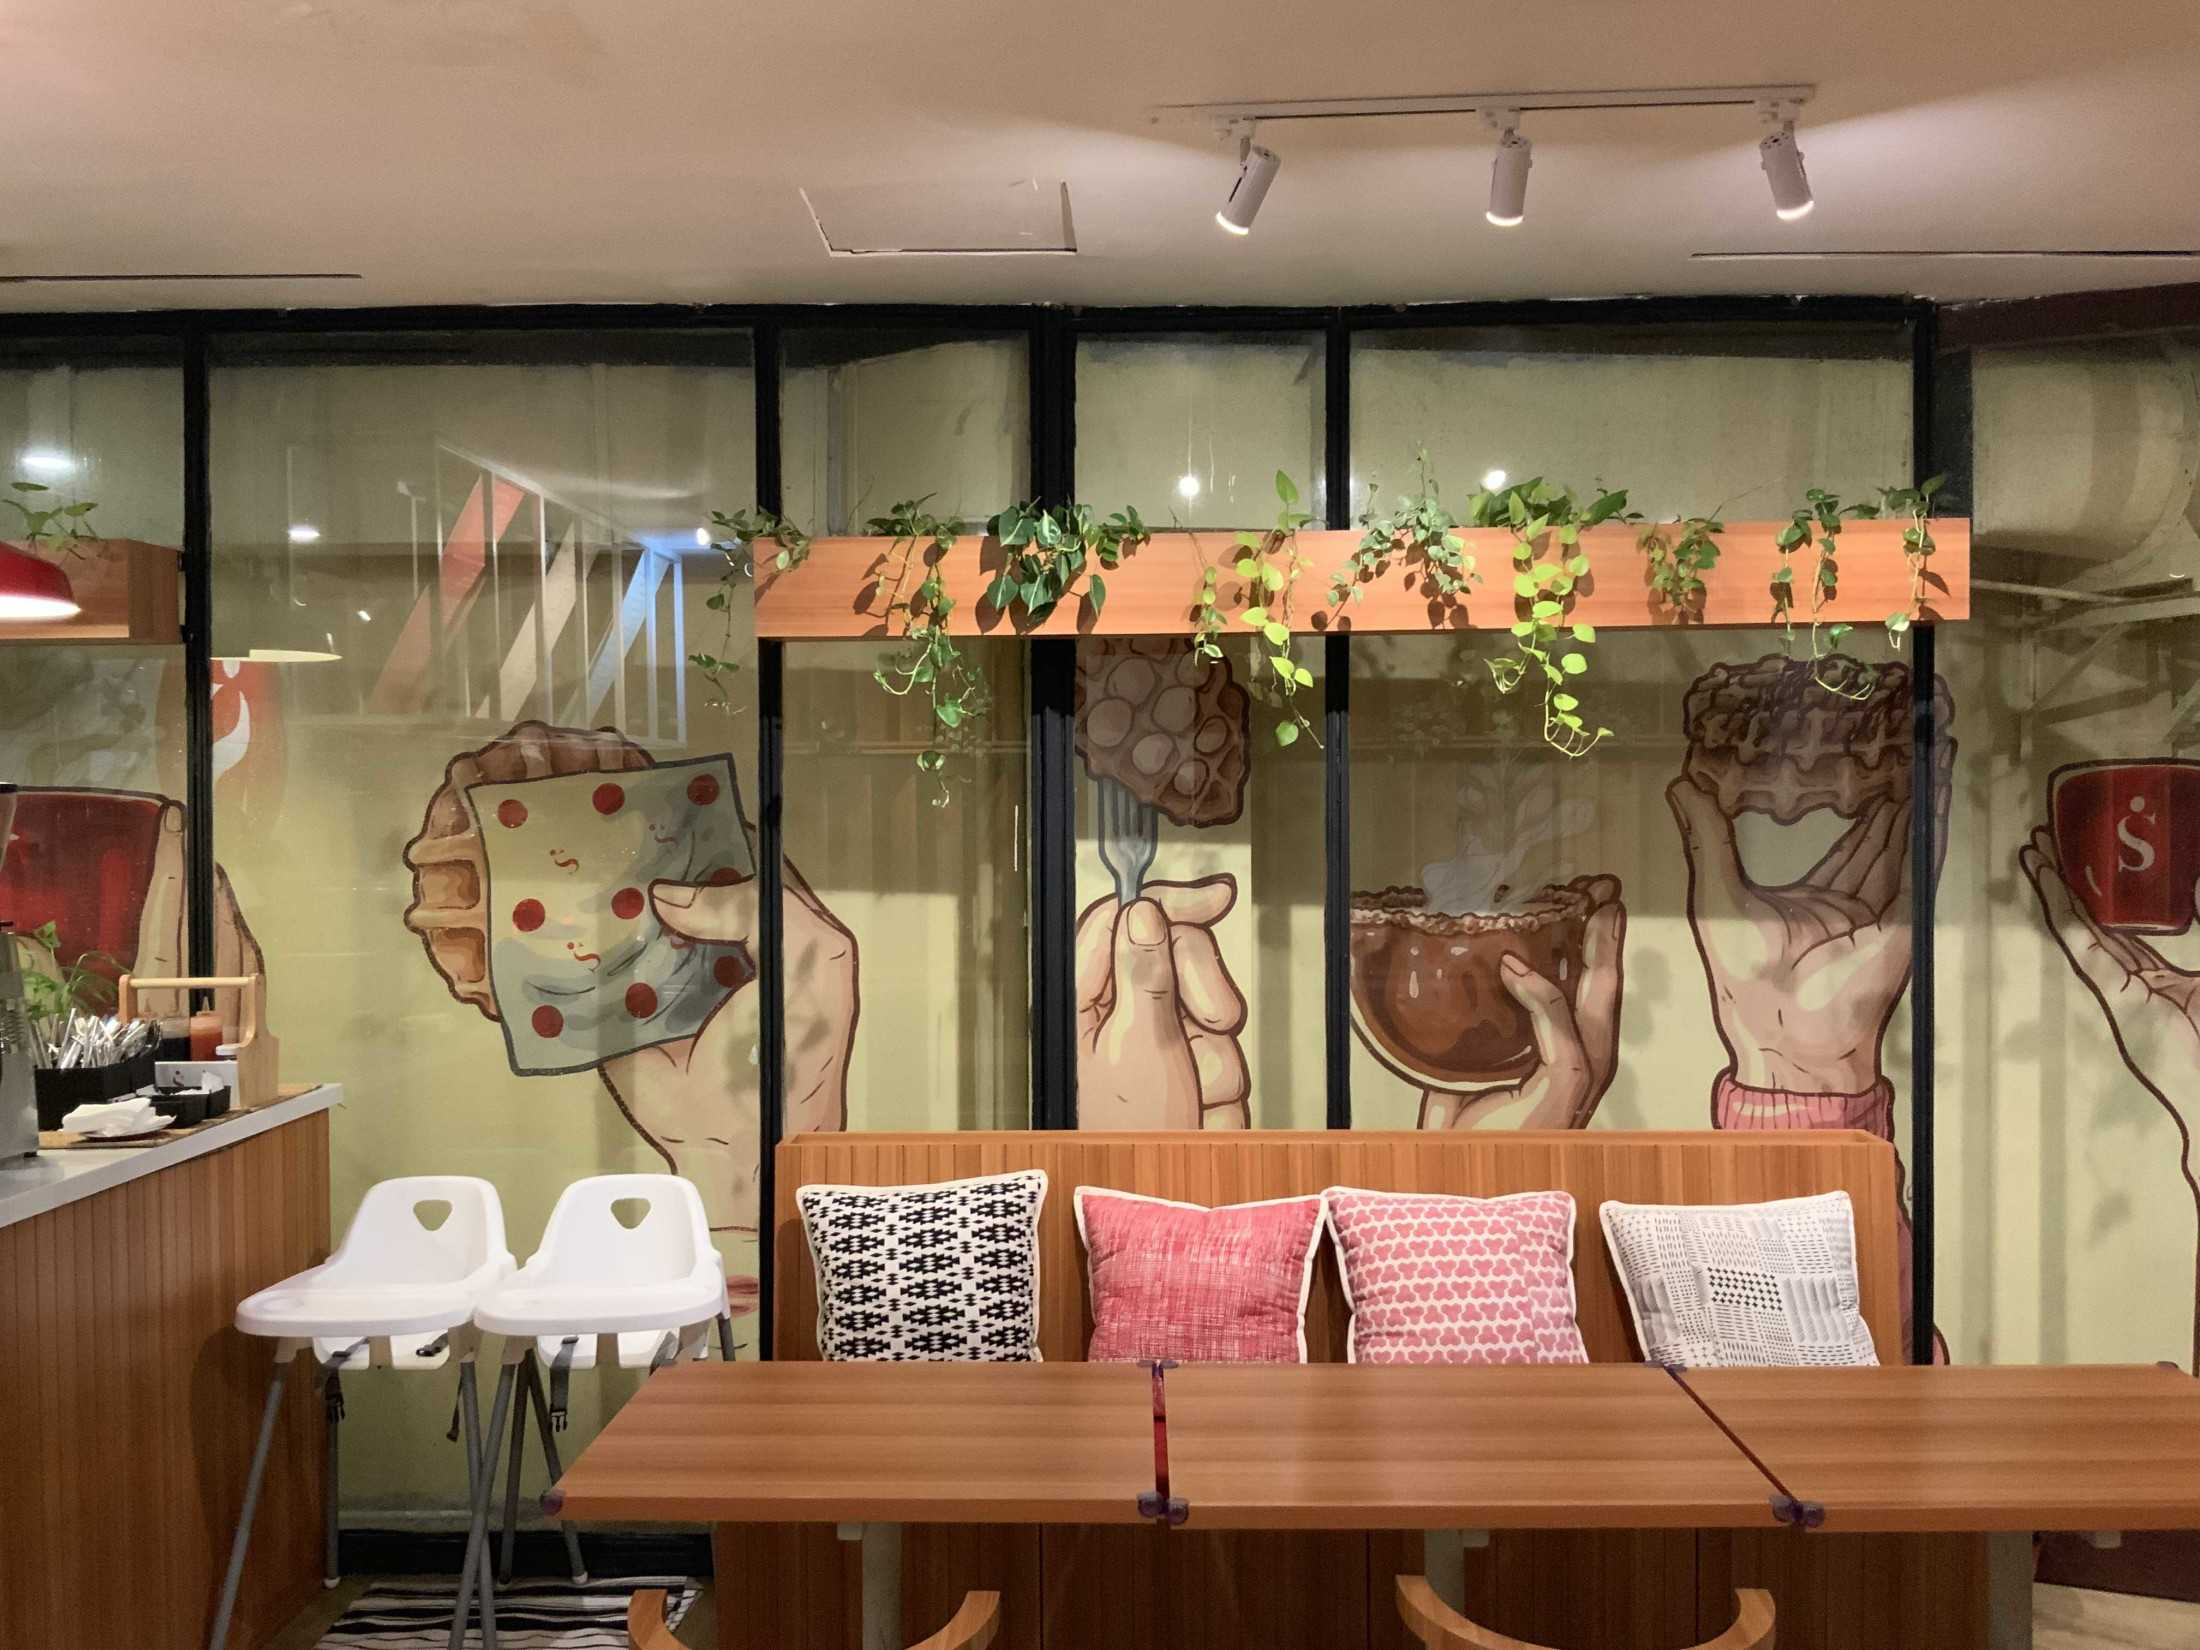 Bito Interior Design N Build Singgah Kitchen & Coffee Jl. Pakubuwono Vi No.2, Rt.1/rw.4, Gunung, Kec. Kby. Baru, Kota Jakarta Selatan, Daerah Khusus Ibukota Jakarta 12120, Indonesia Jl. Pakubuwono Vi No.2, Rt.1/rw.4, Gunung, Kec. Kby. Baru, Kota Jakarta Selatan, Daerah Khusus Ibukota Jakarta 12120, Indonesia Bito-Interior-Design-N-Build-Singgah-Kitchen-Coffee  90042